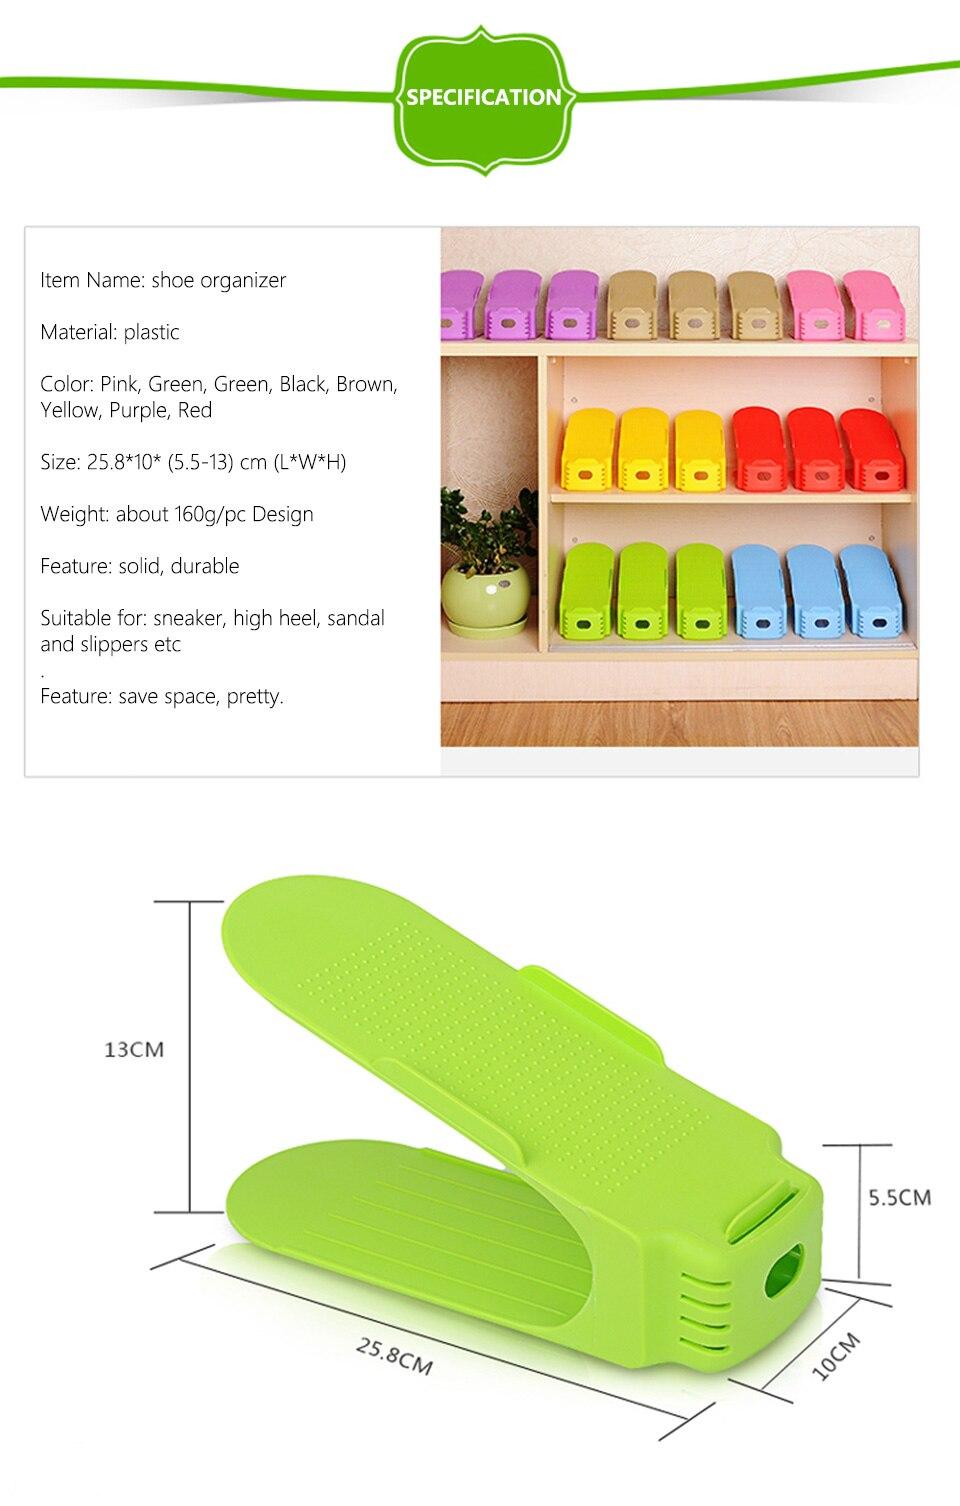 1pc Shoes Organizers Display Rack Shoes Organizer Plastic Space Saving Shoe Storage Shoe Racks Double Cleaning Storage_04